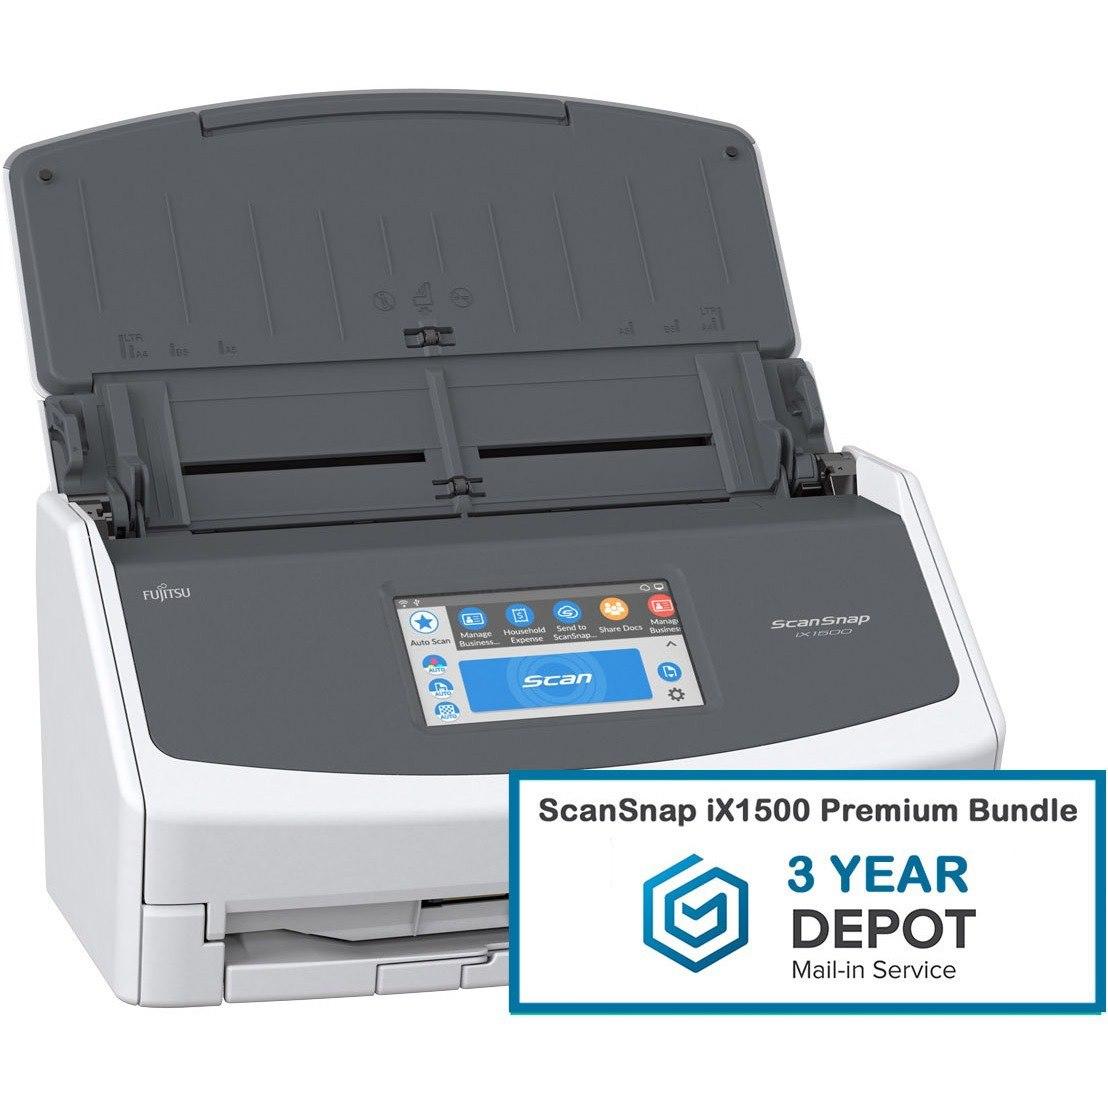 ScanSnap iX1500 Premium Bundle - 3 year Depot Warranty